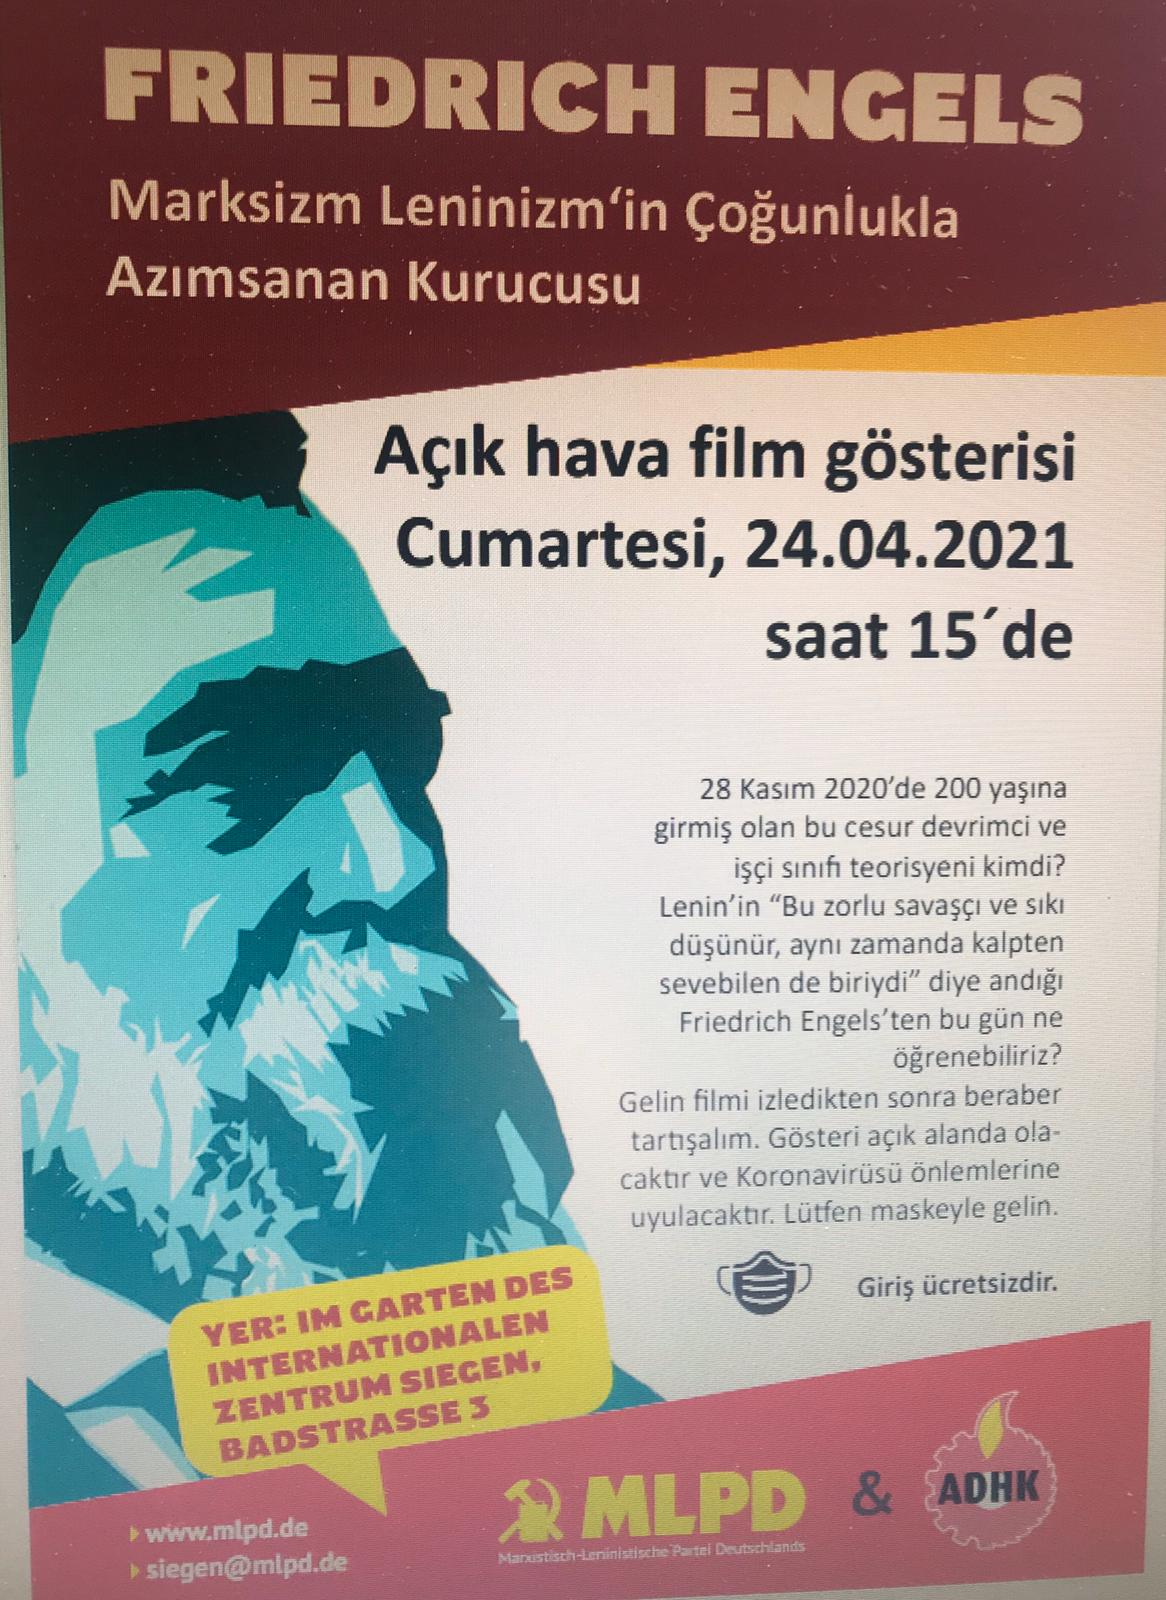 Friedrich Engels, Açık hava film gösterisi